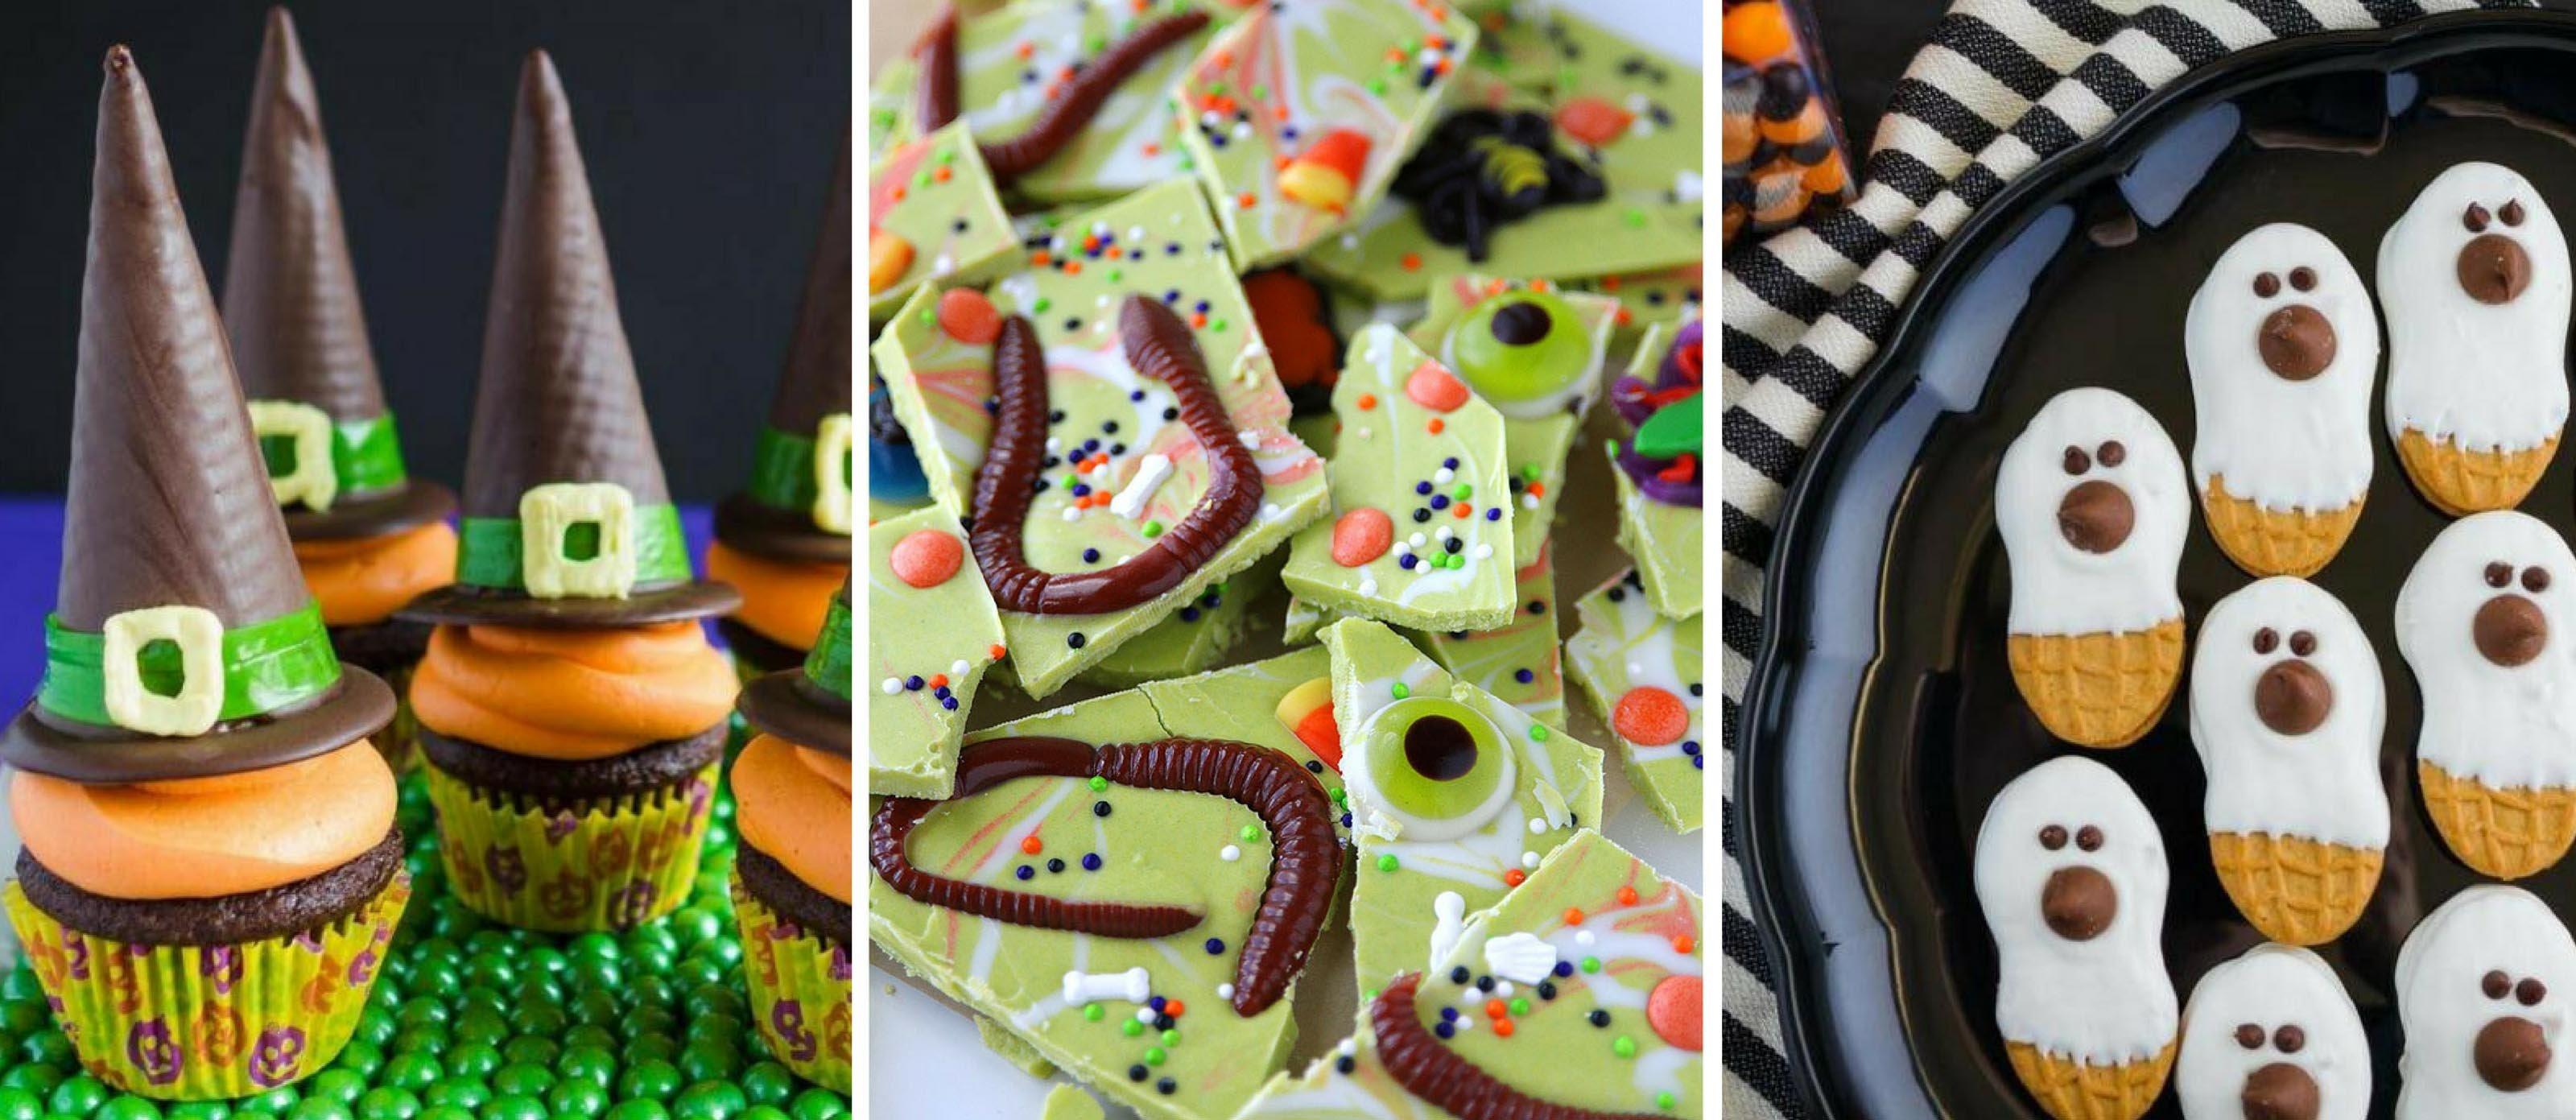 5-spooktacular-halloween-snack-ideas-hero